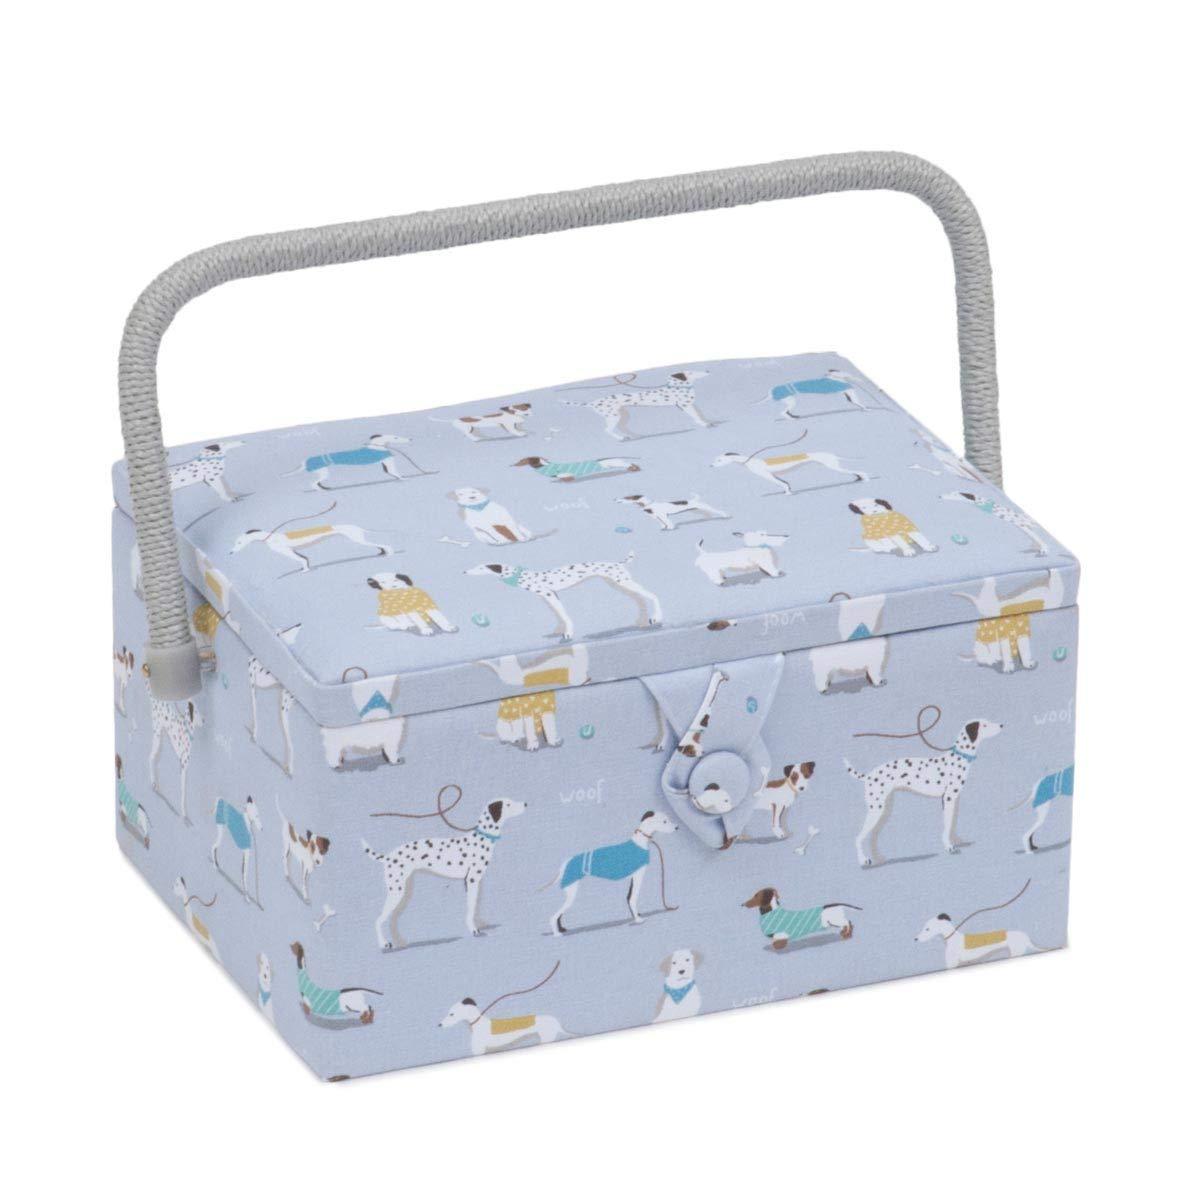 Medium Sewing Box / Organiser - A Dog's Life | HobbyGift MRM\446 | 19x26x14.5cm